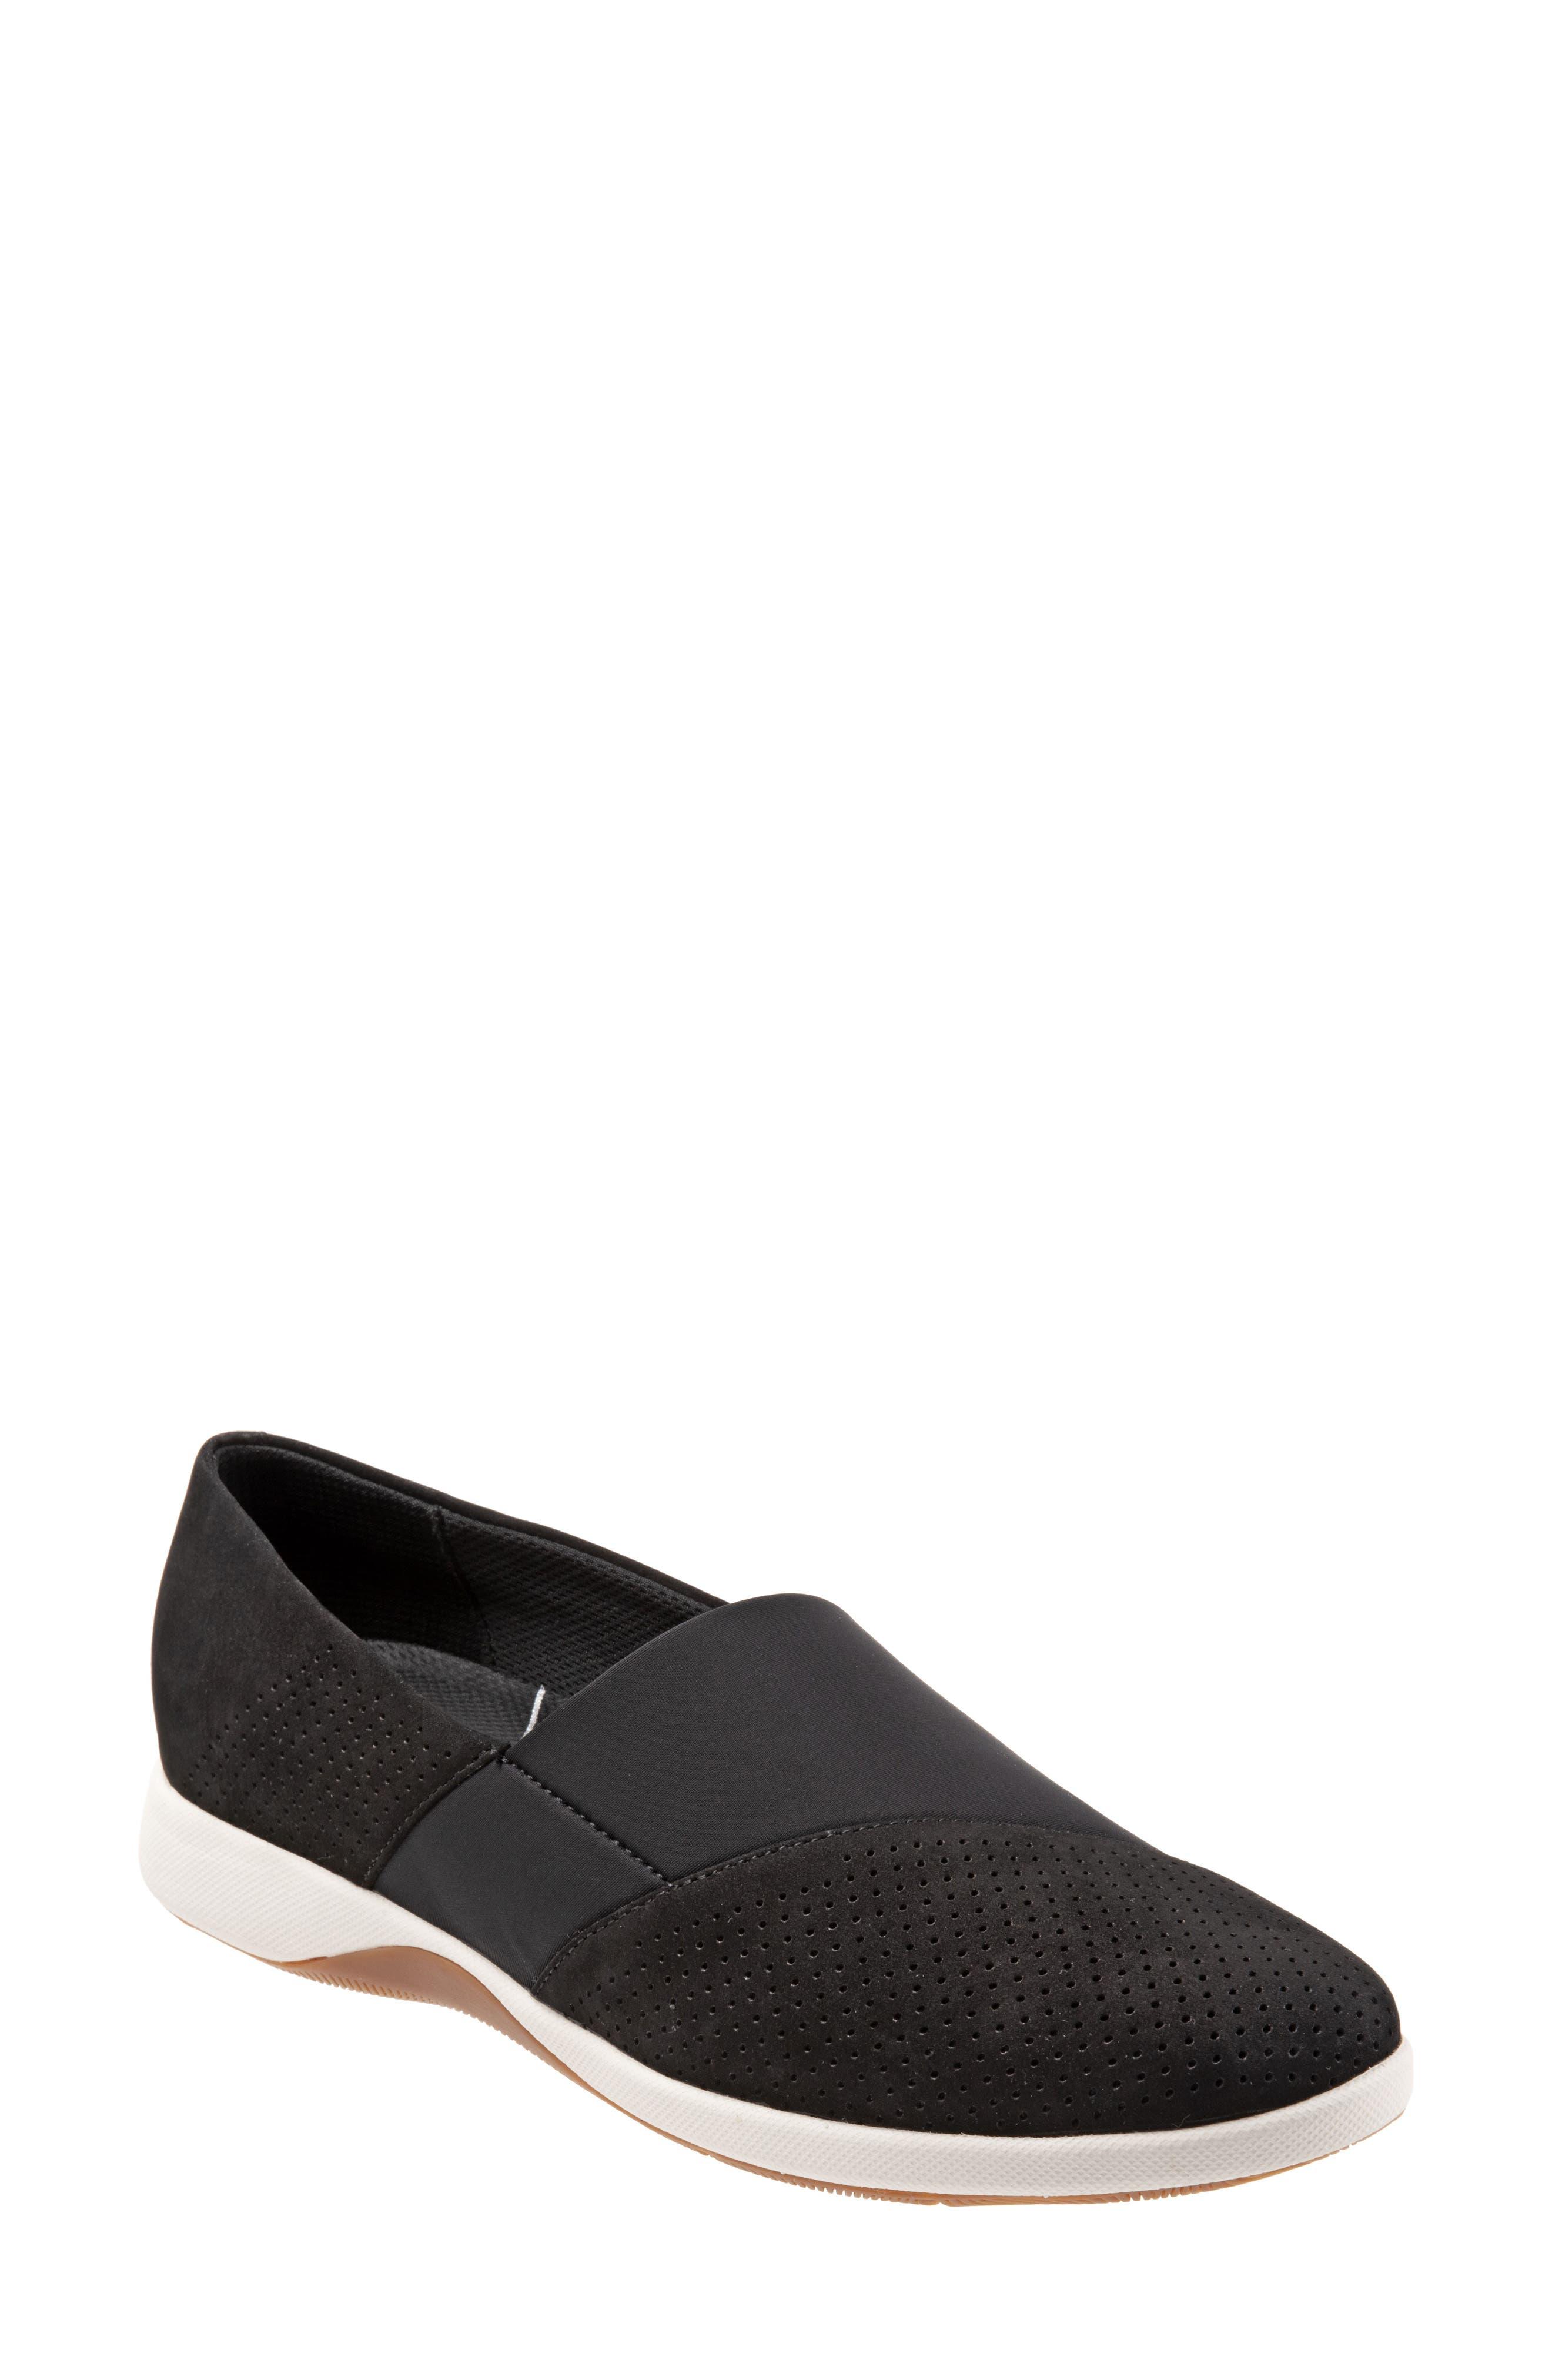 Softwalk Hana Slip-On,- Black